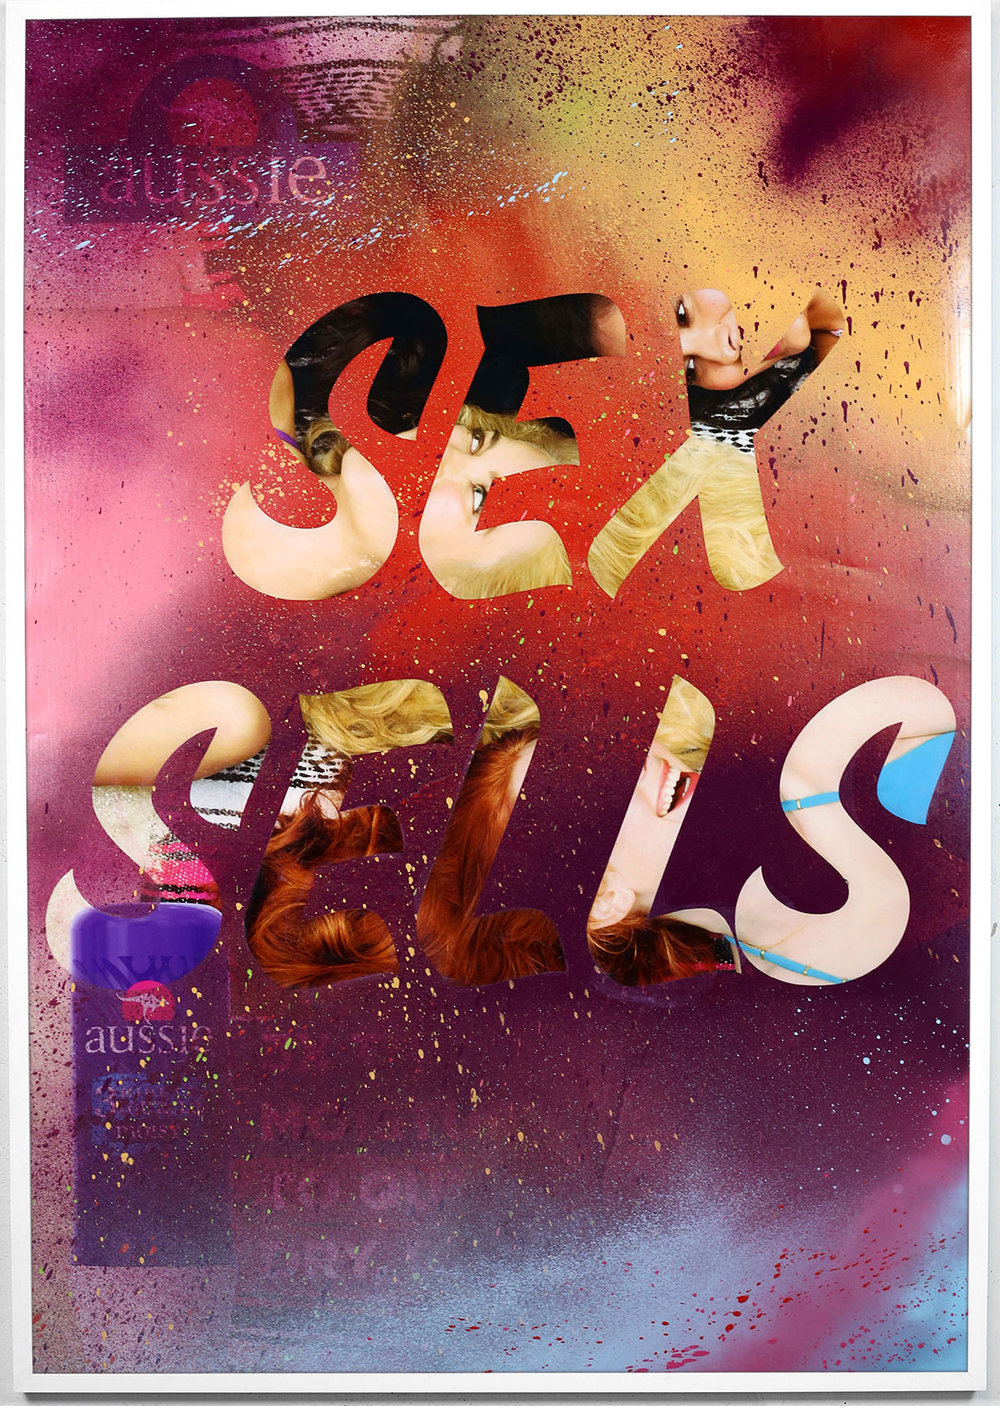 sex-sells-aussie-dan-alva.jpg